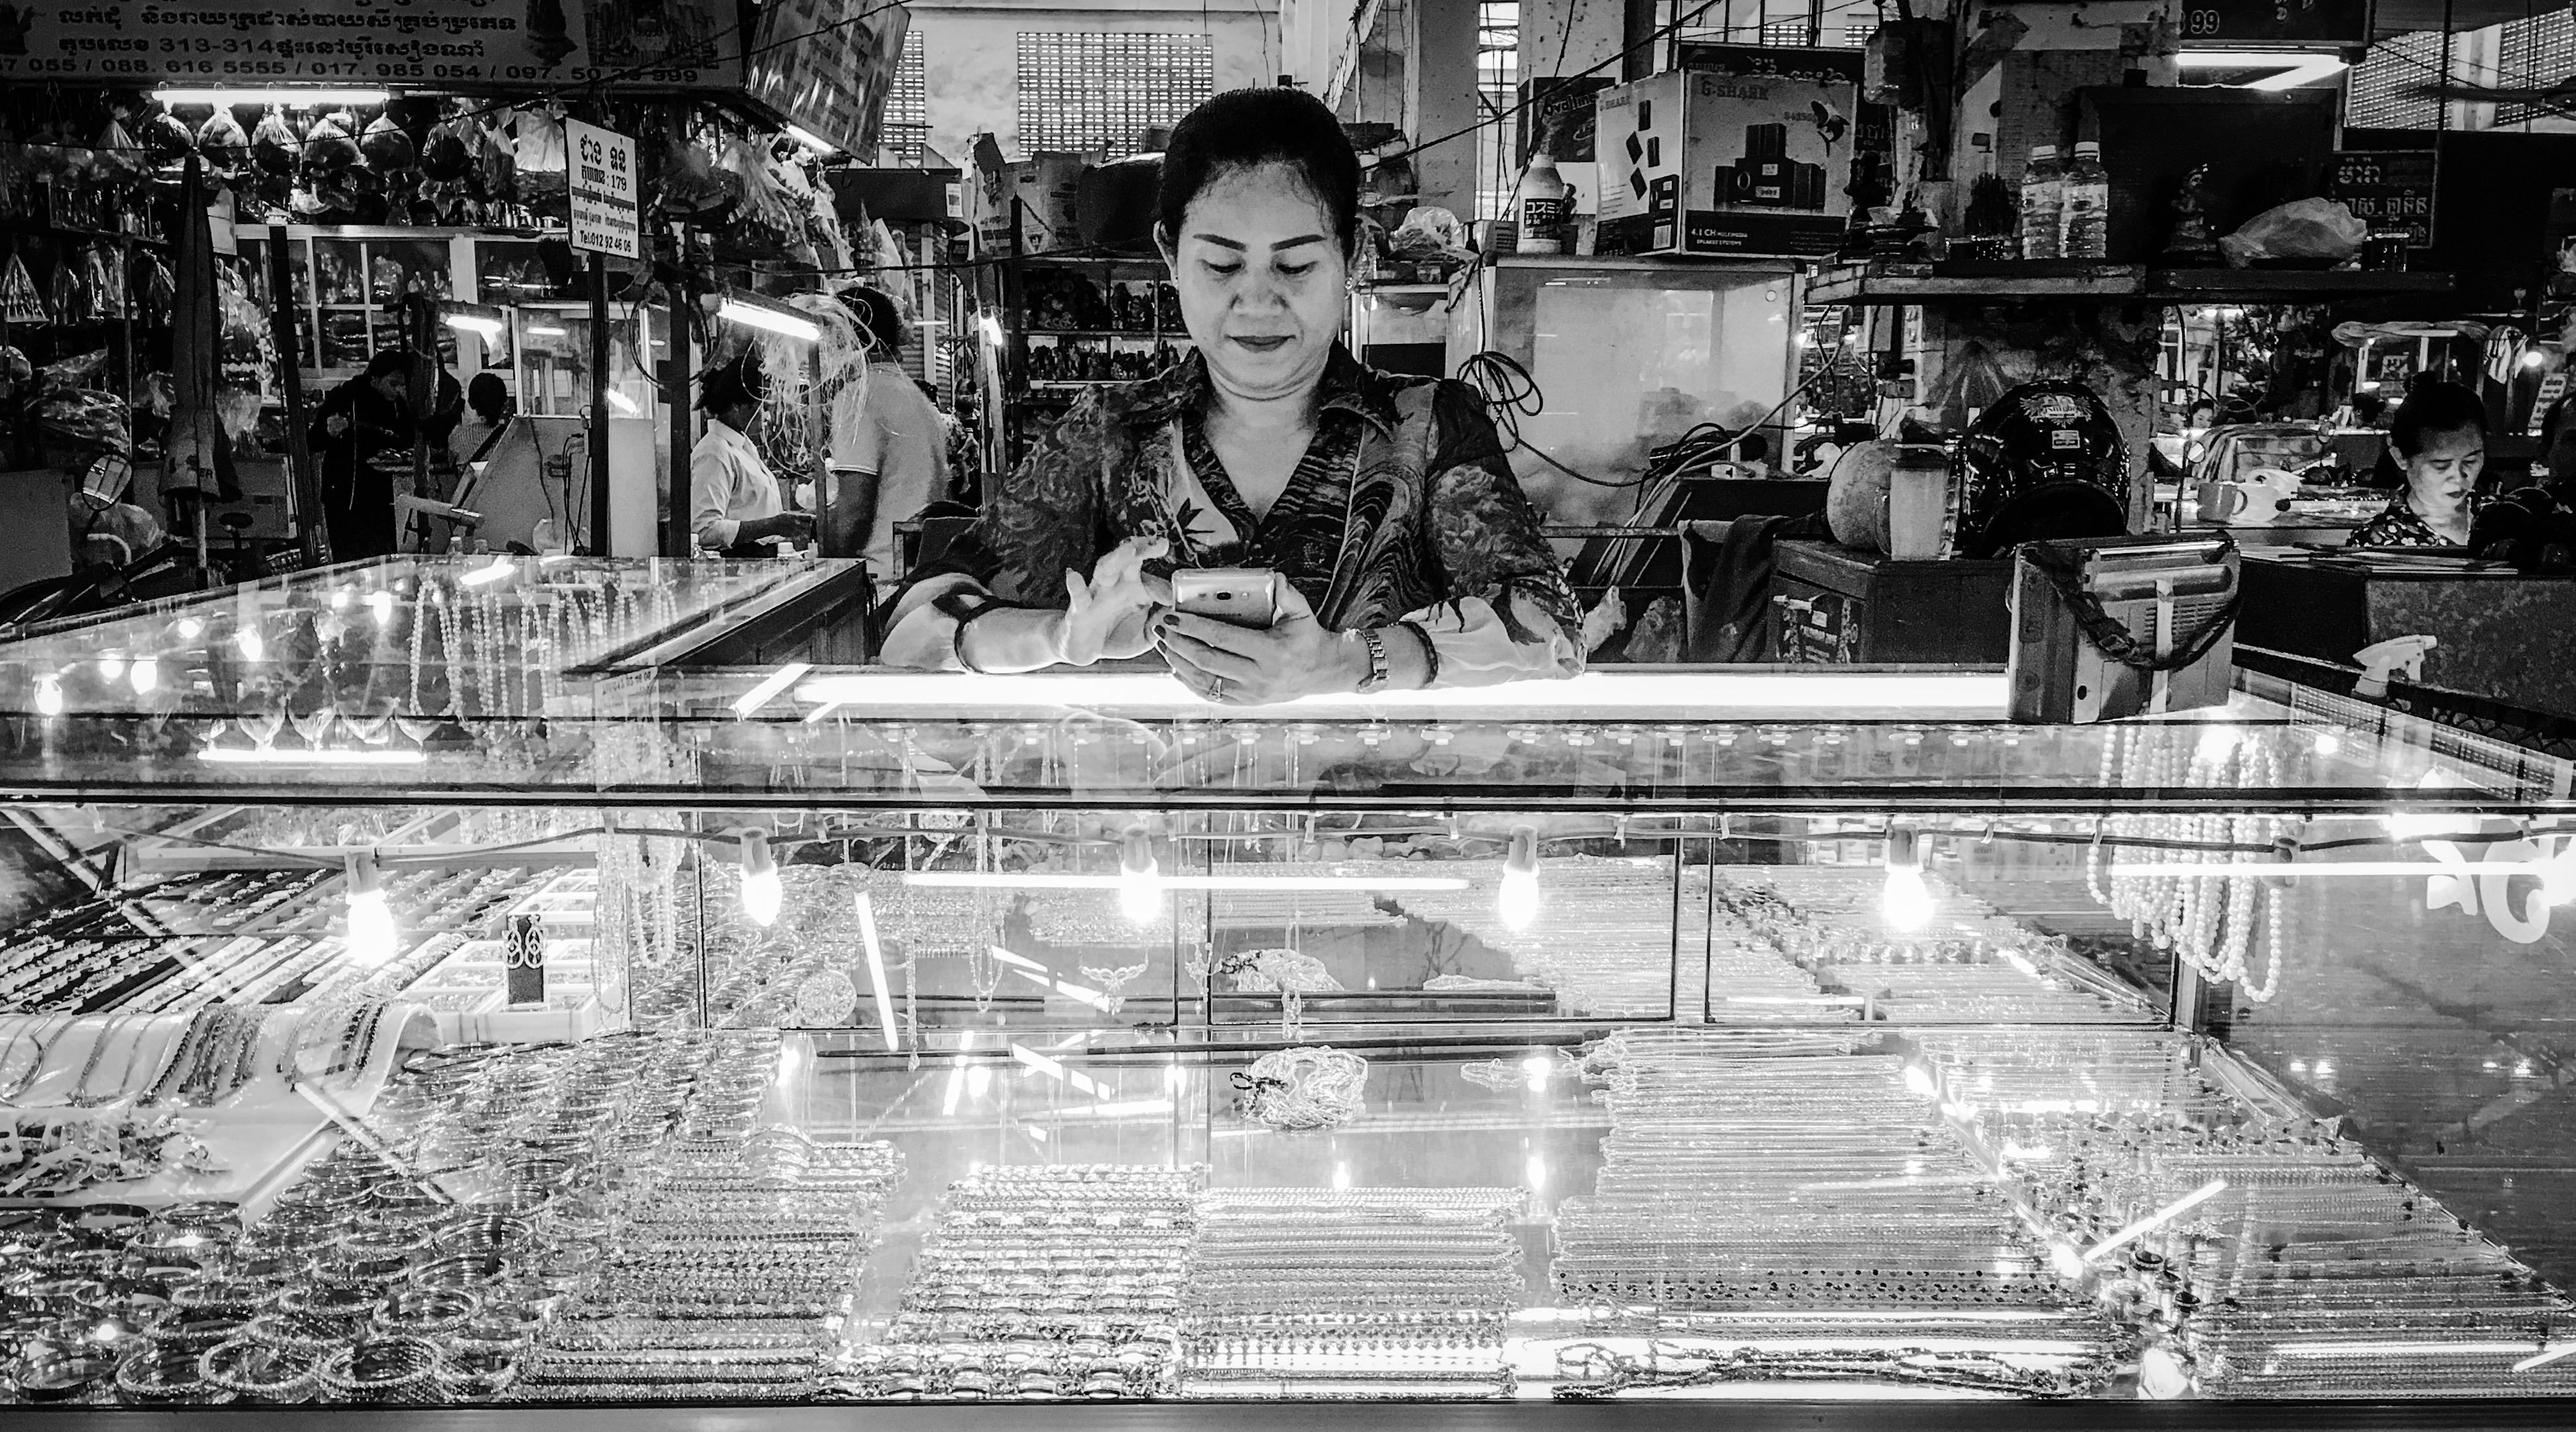 Siem Reap, Cambodia, December 2016